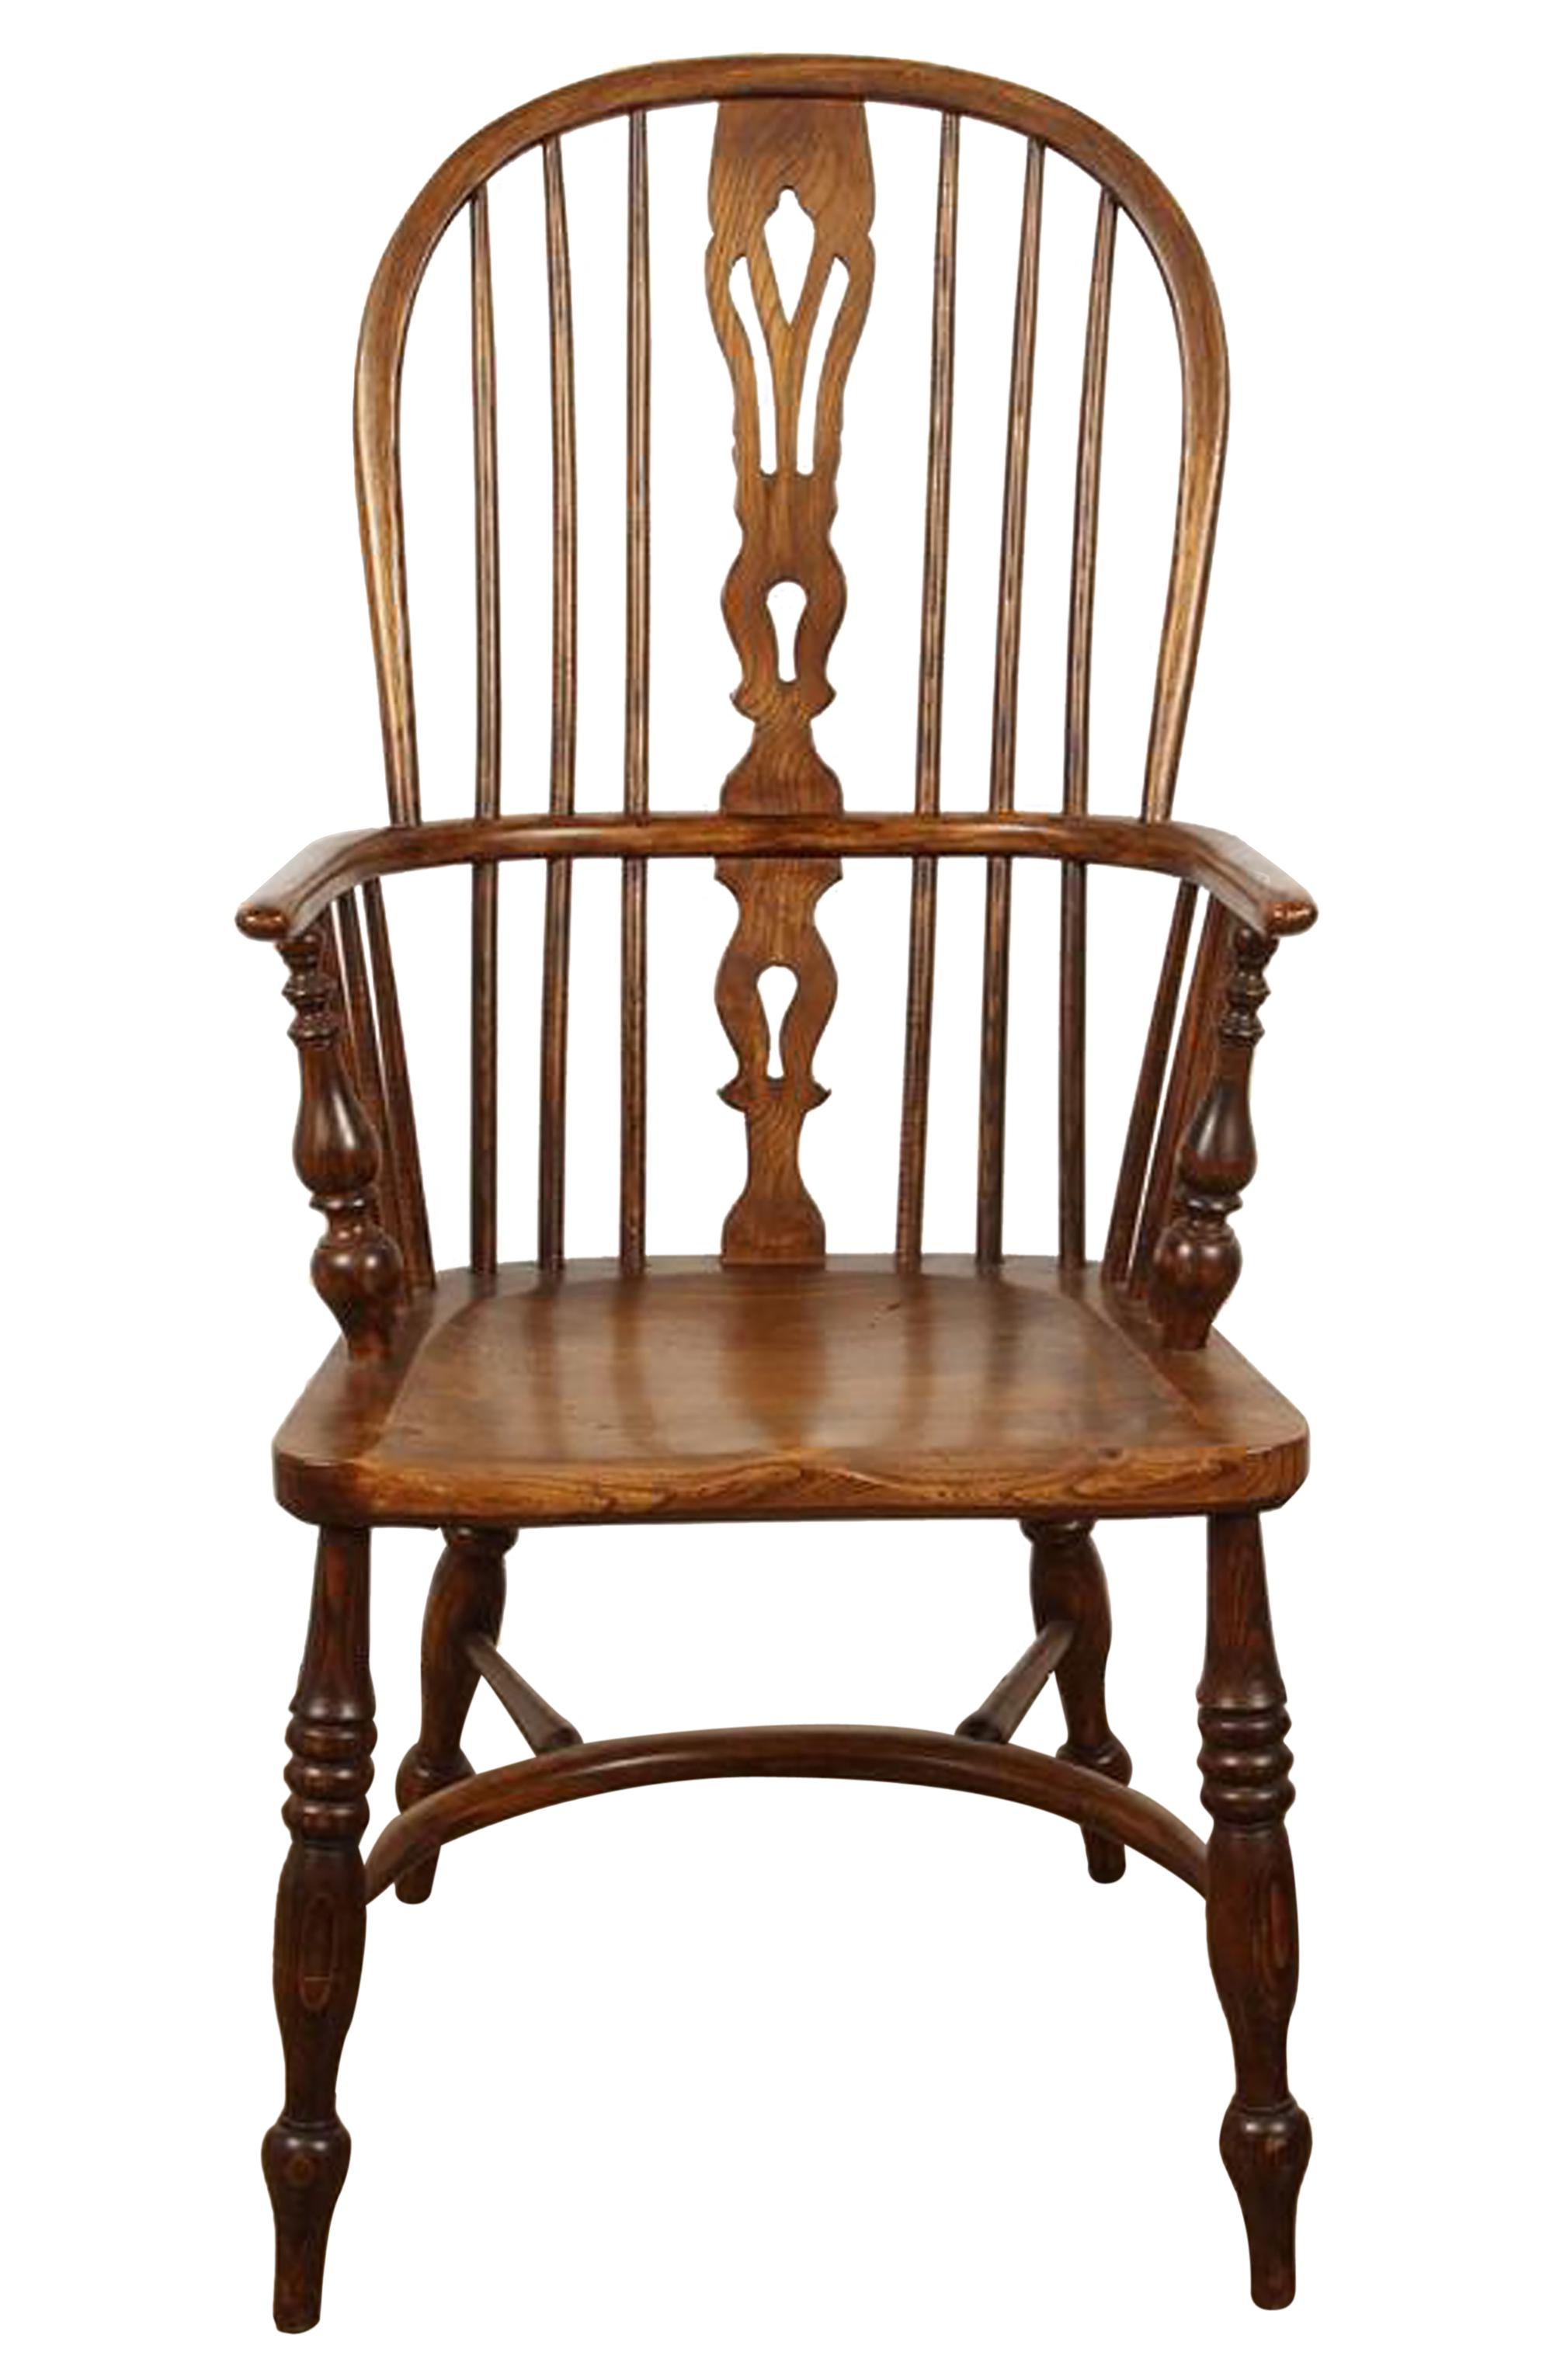 English Yew High Back Chair - Folk Art Traditional Armchairs & Club